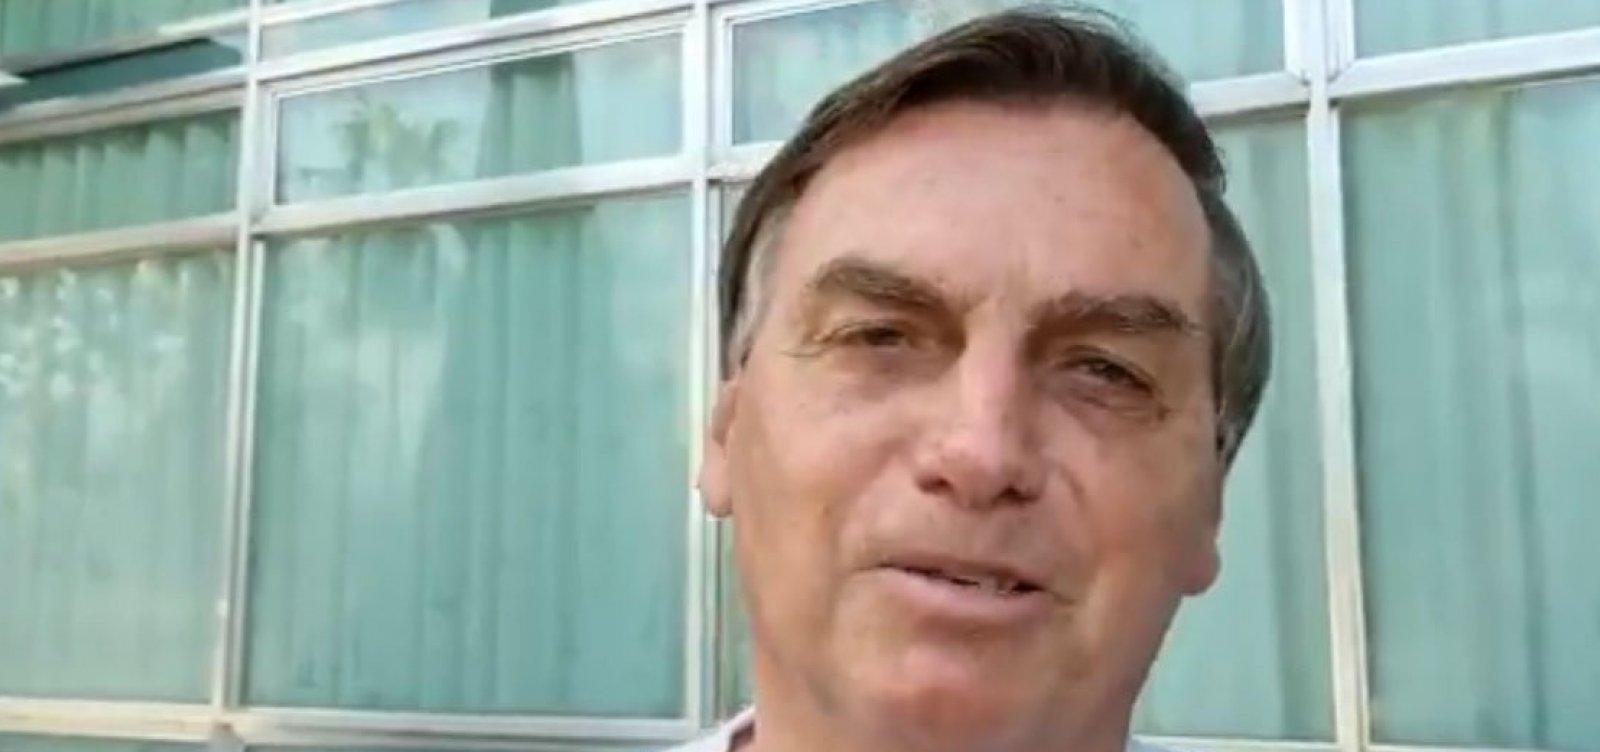 Primeira fala de Bolsonaro após Brasil ultrapassar 500 mil mortes por Covid é sobre o foragido Lázaro